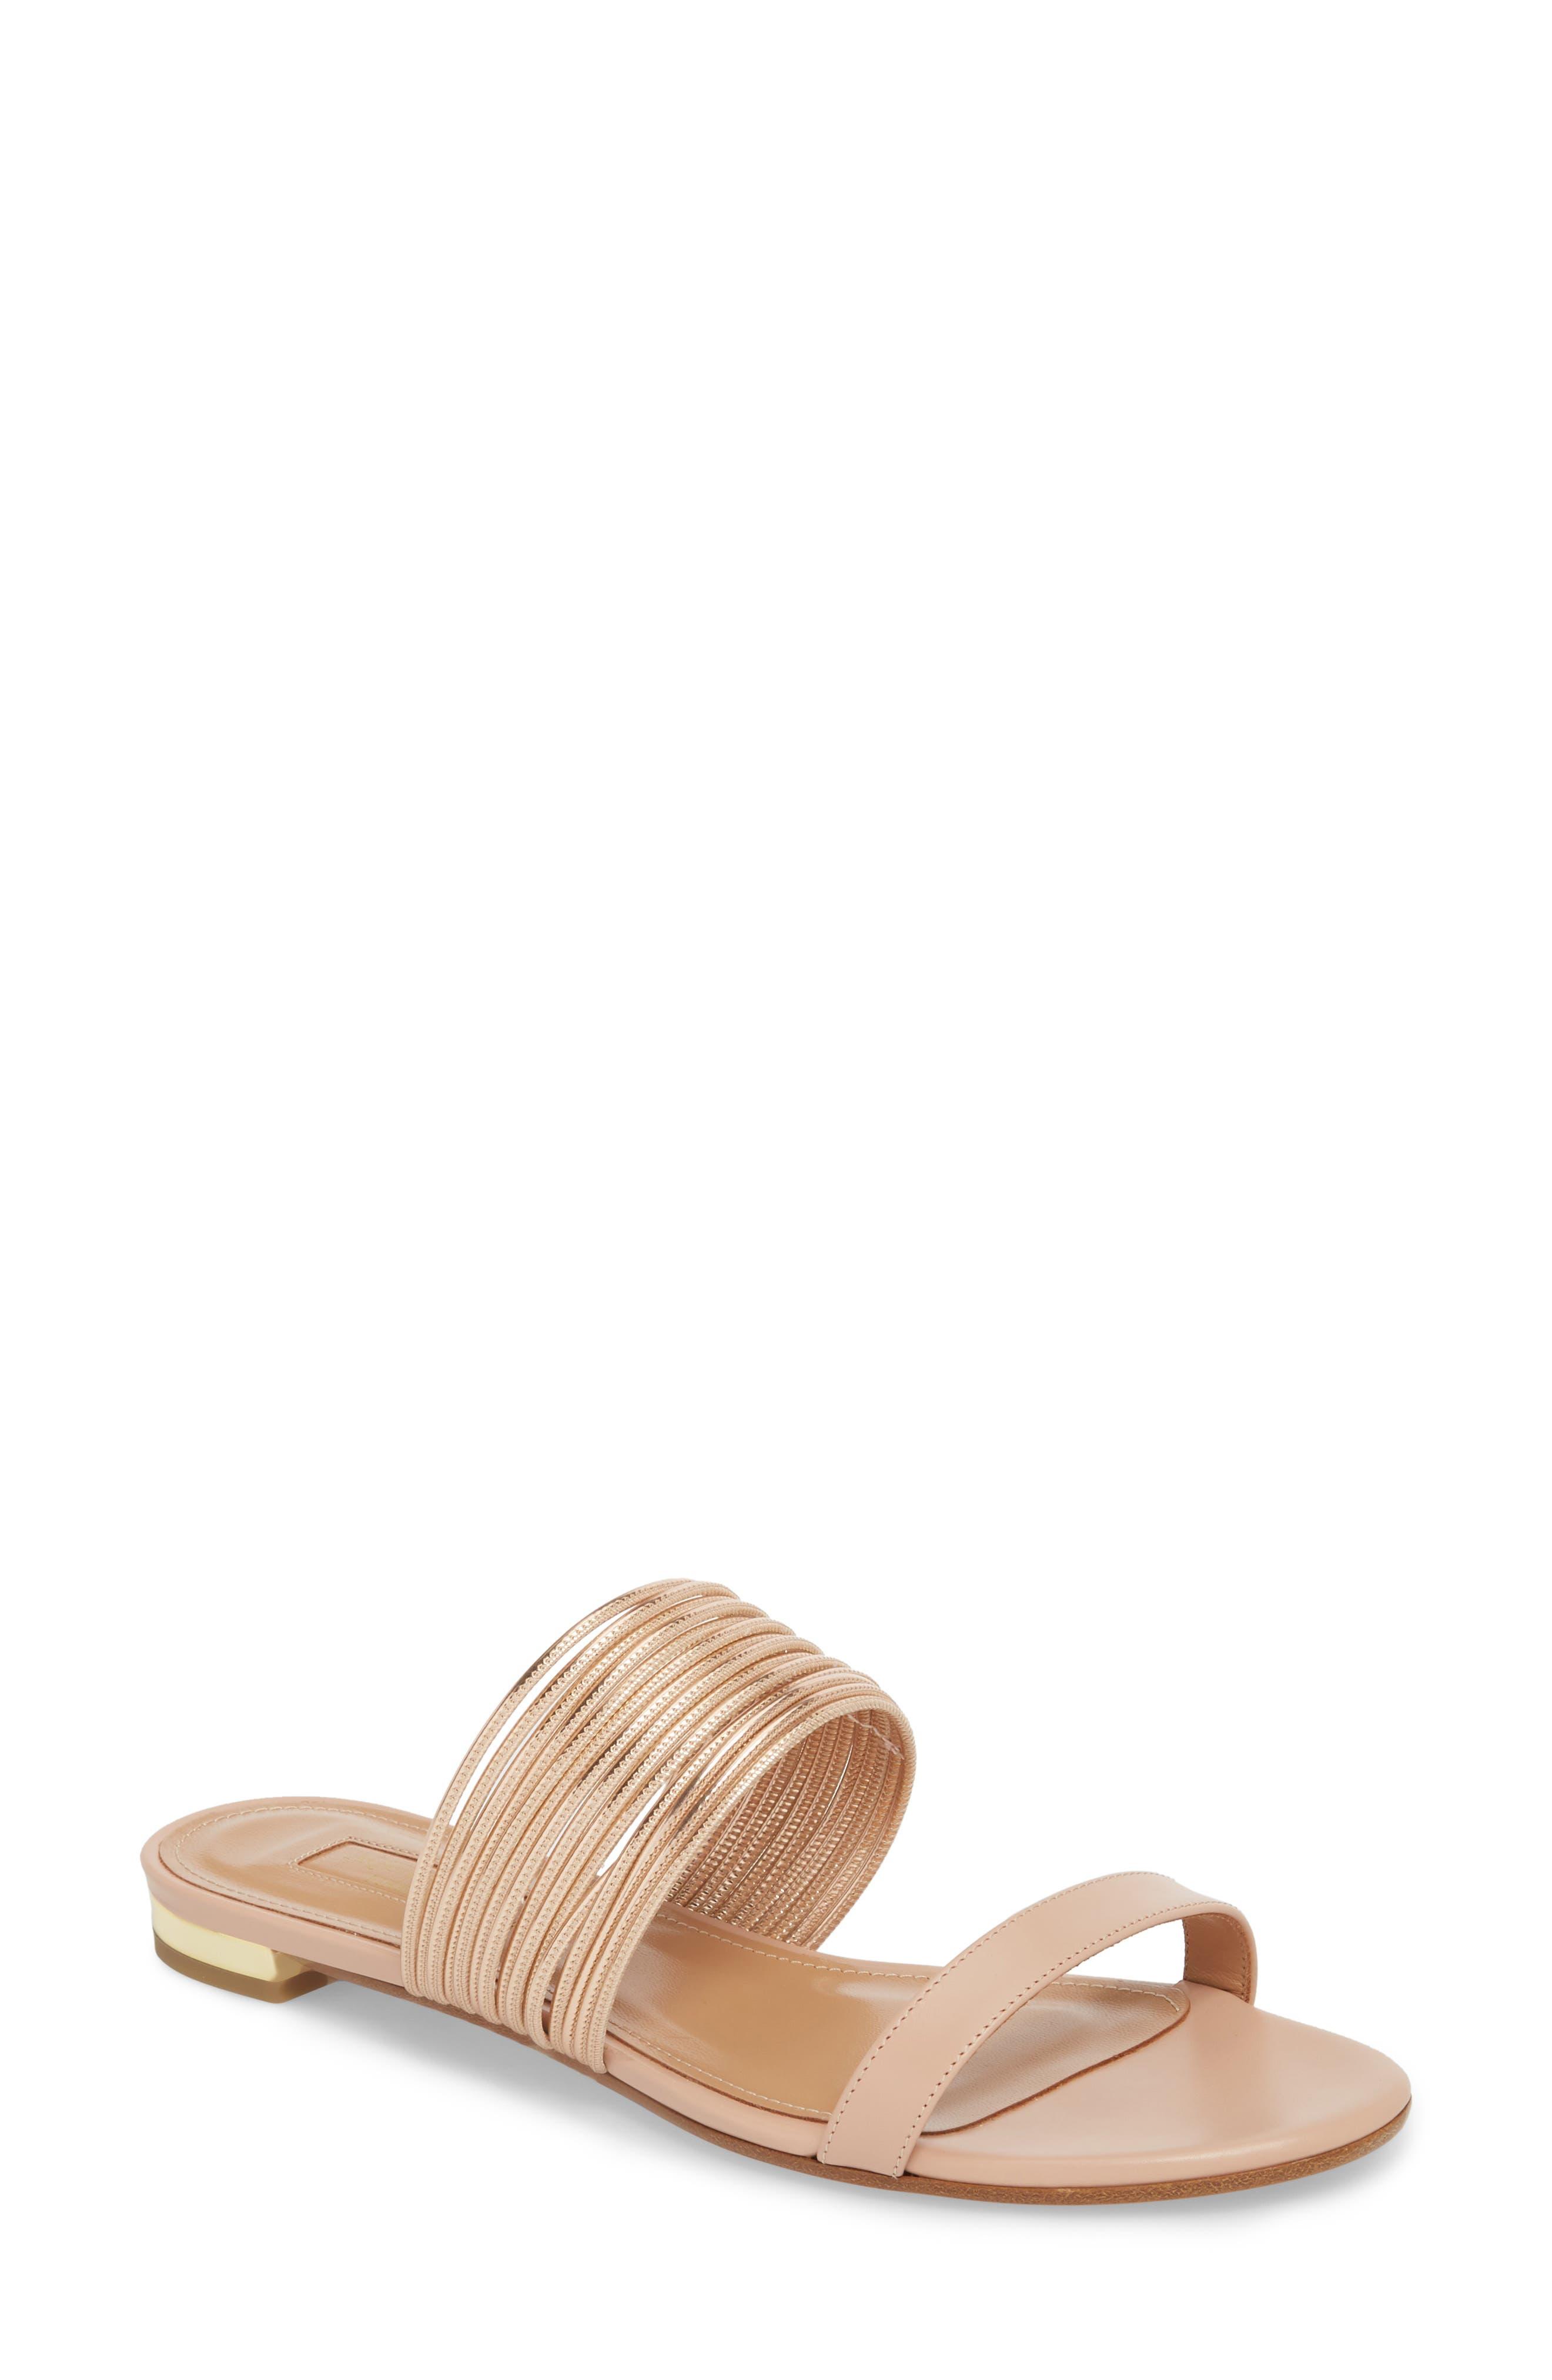 Rendezvous Metallic Sandal,                         Main,                         color, POWDER PINK/CIPRIA